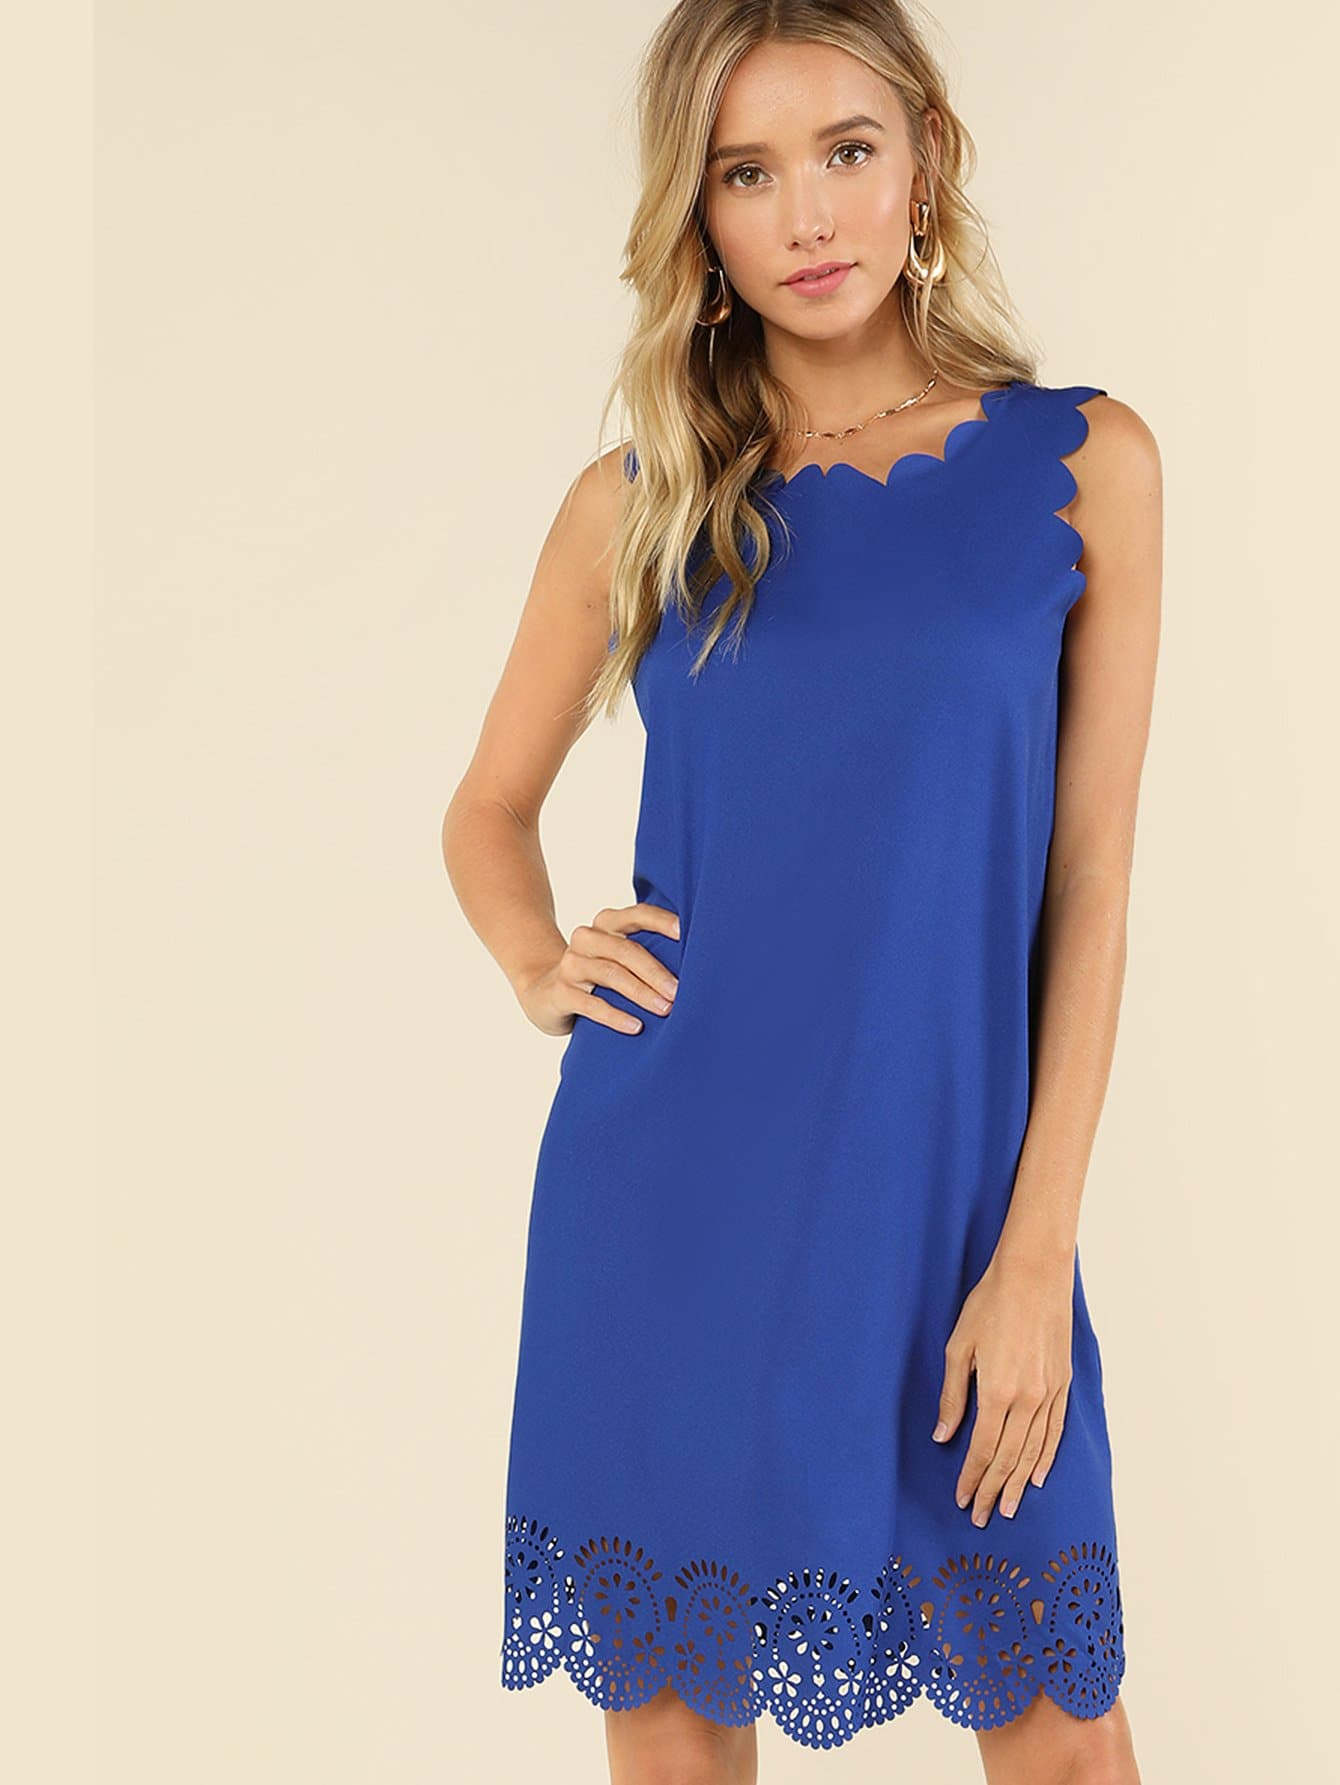 Laser Cut Insert Scalloped Edge Dress scalloped edge botanical print dress